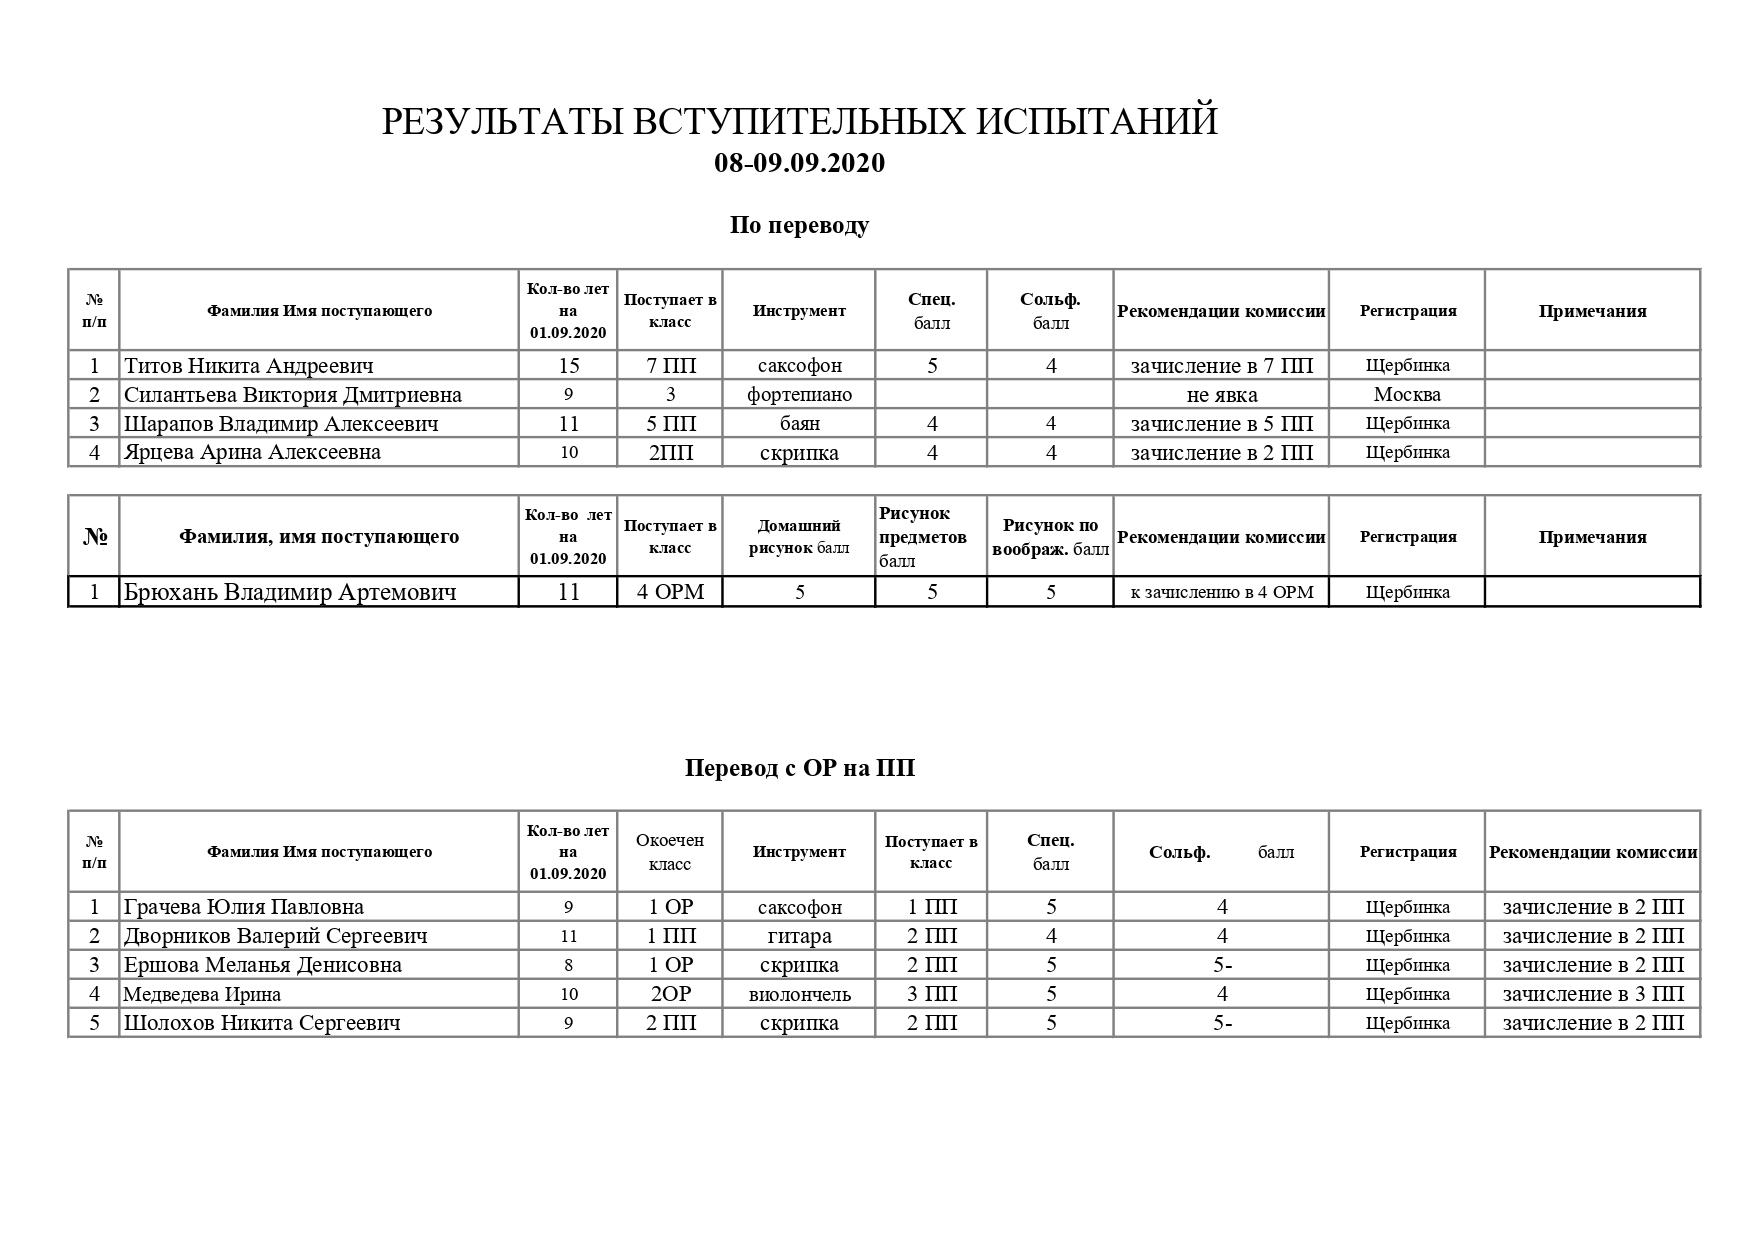 Рез.вст.исп. 08-09.09.20 перевод_page-0001 (1)